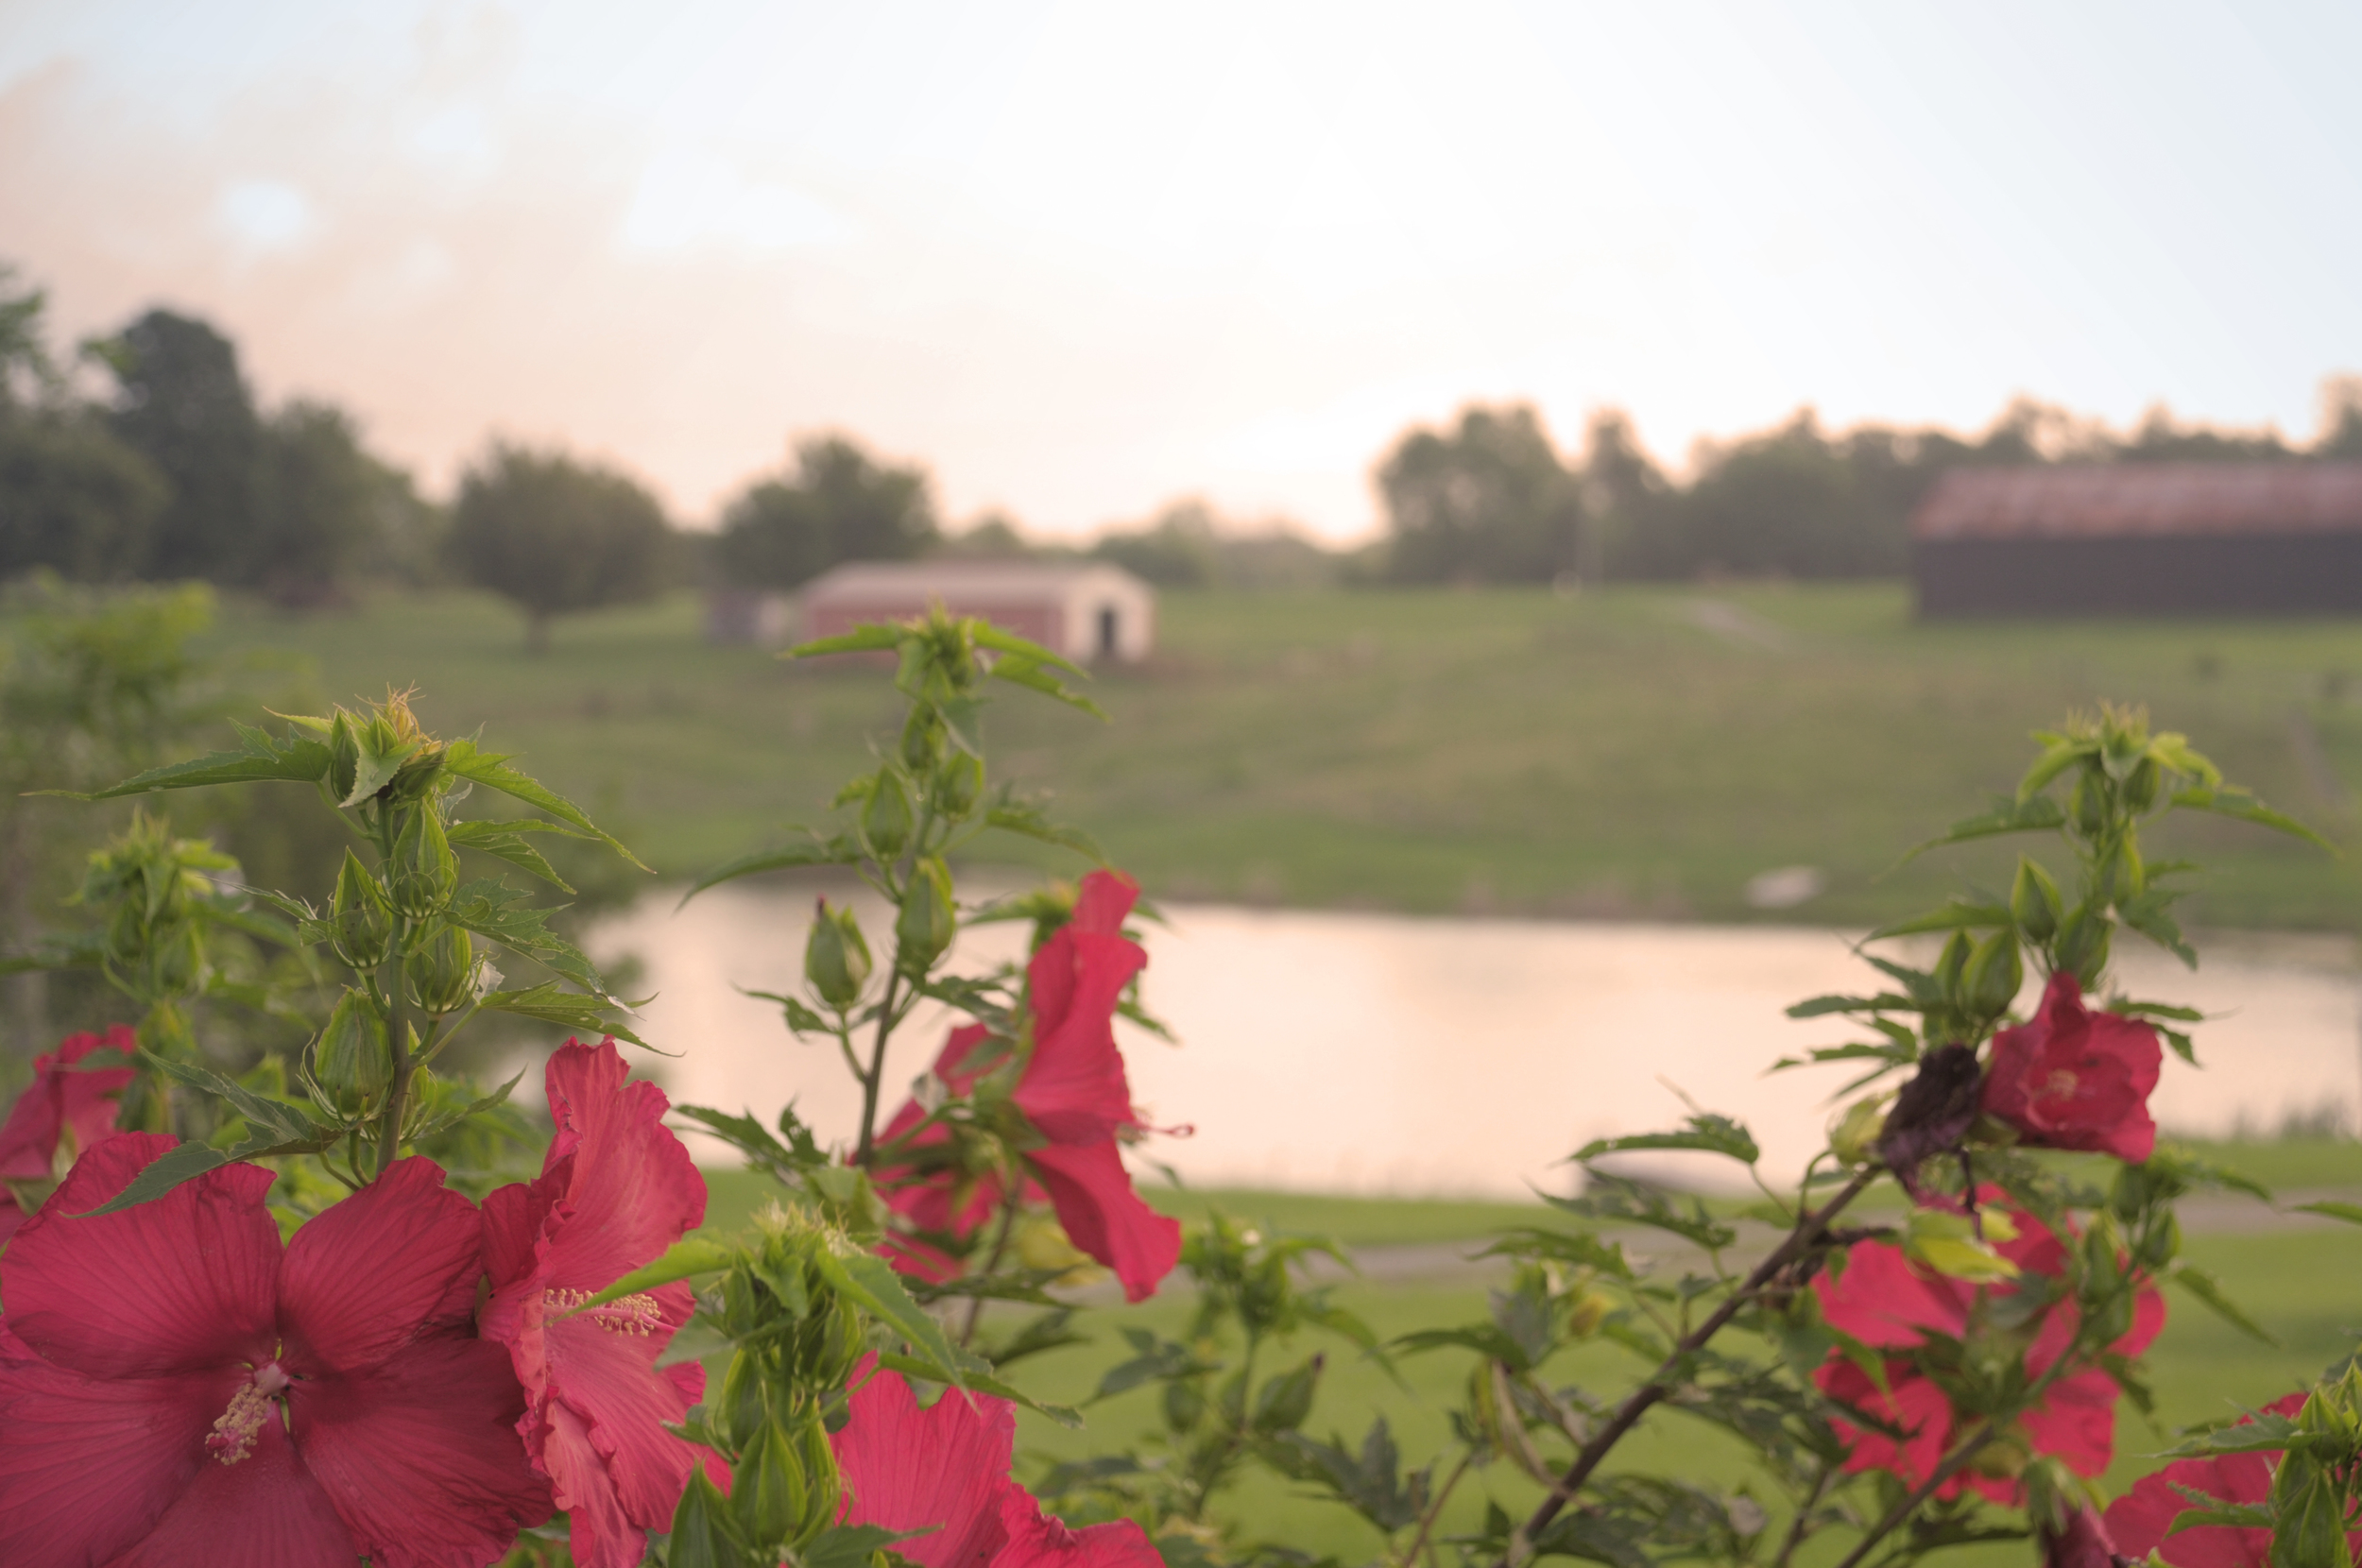 Farm_flower2.jpg